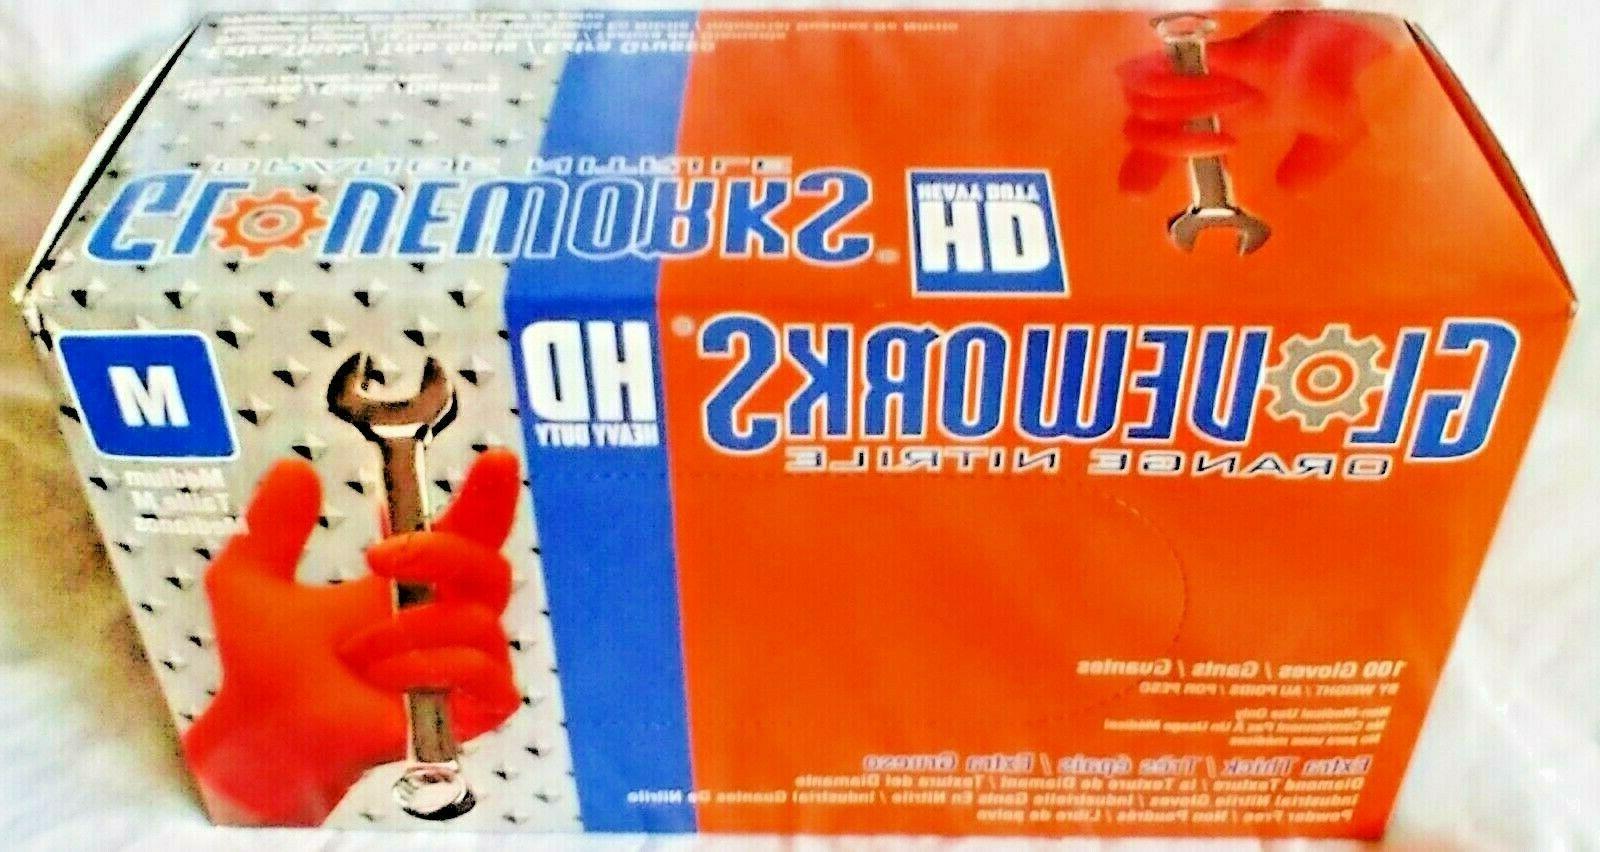 GloveWorks HD Green Latex Powder Free